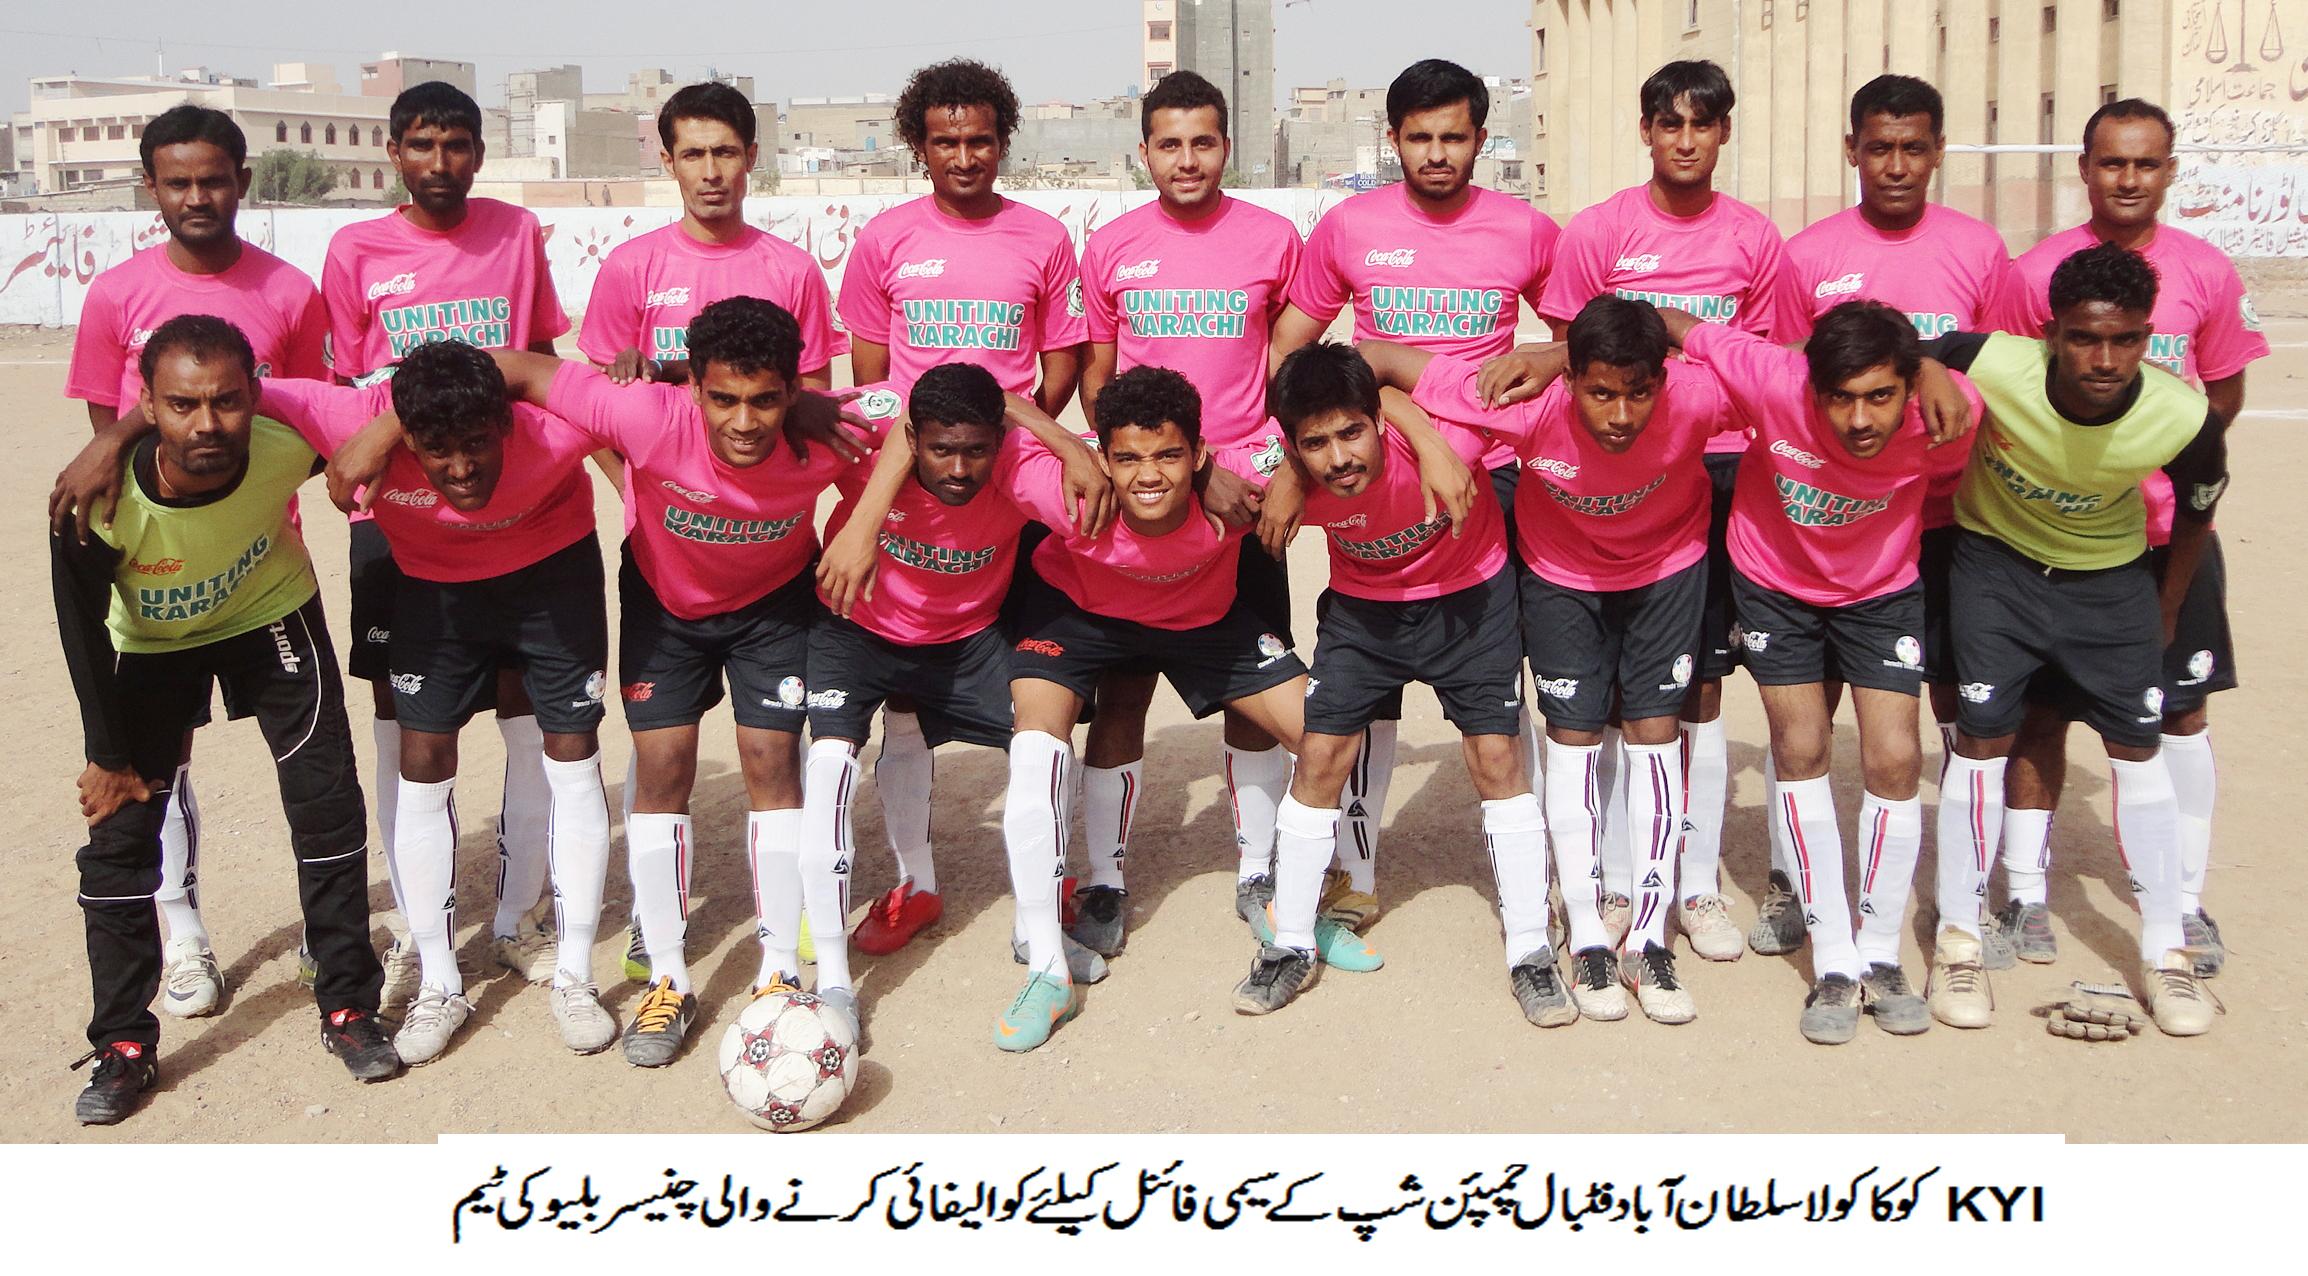 Coca-Cola Sultanabad Championship: Chanesar Blue and Chanesar Mohammedan enter semi-finals